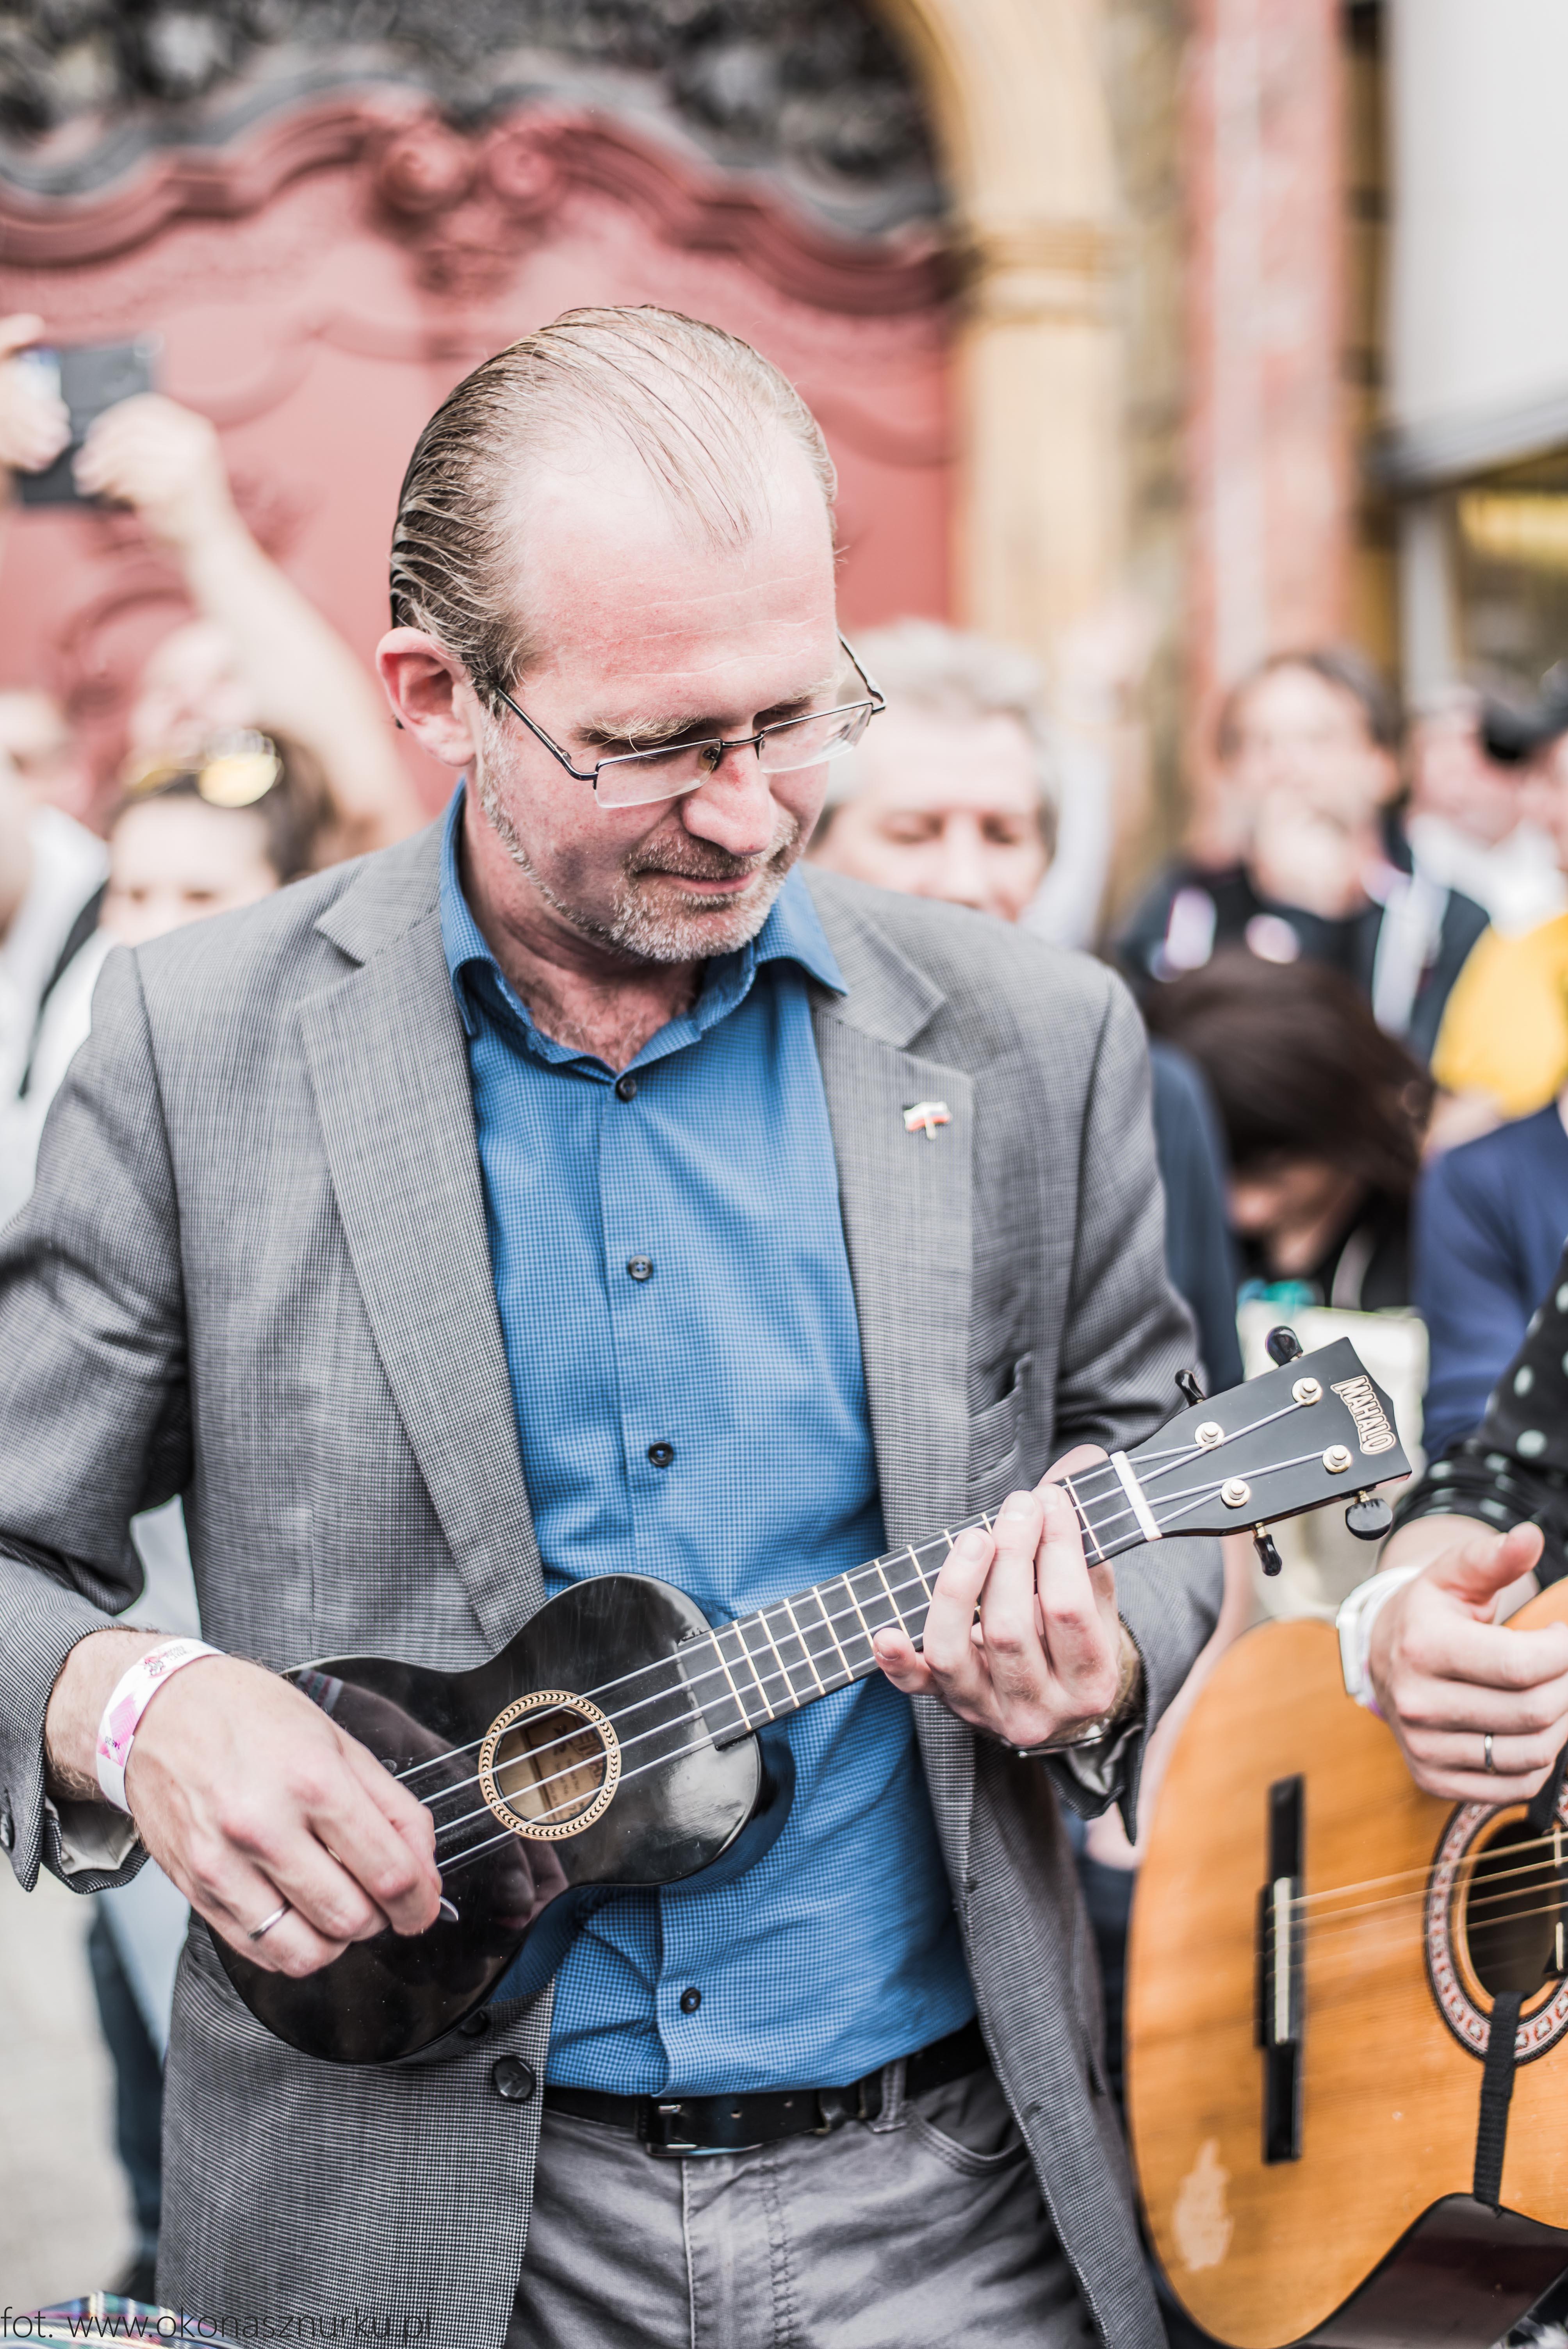 wroclawski-gitarowy-rekord-guinnessa-2018 (15)